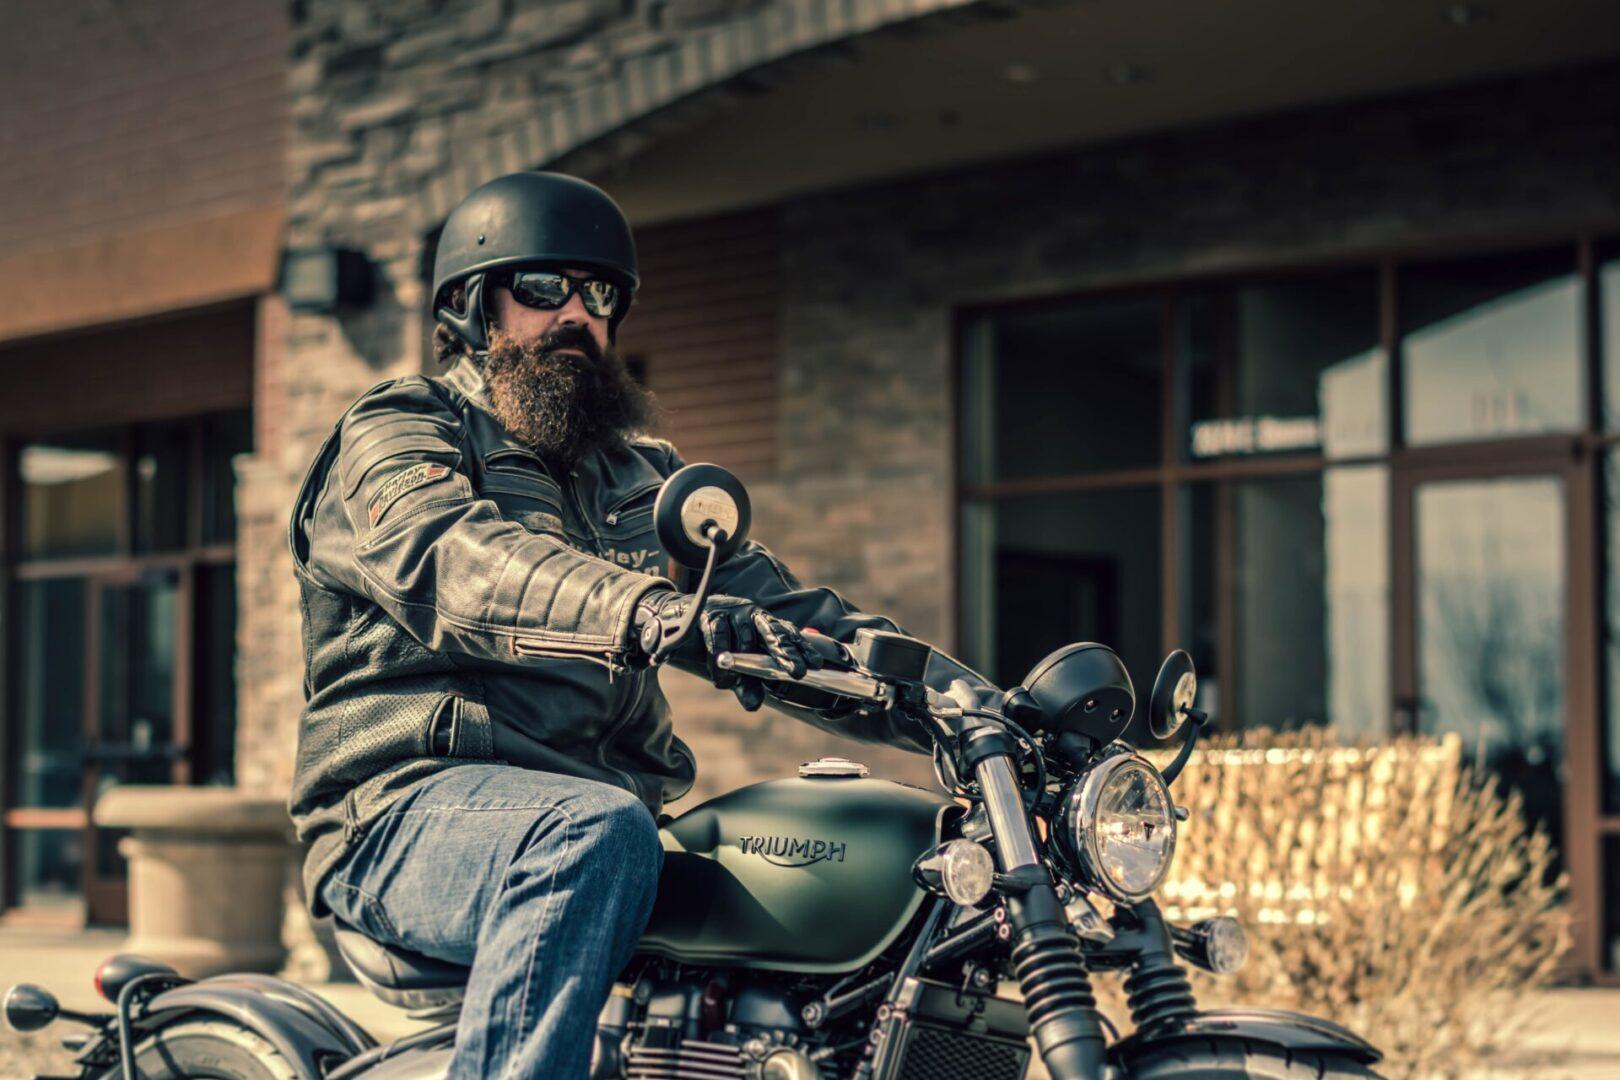 selective-focus-photography-of-man-riding-cafe-racer-2036262